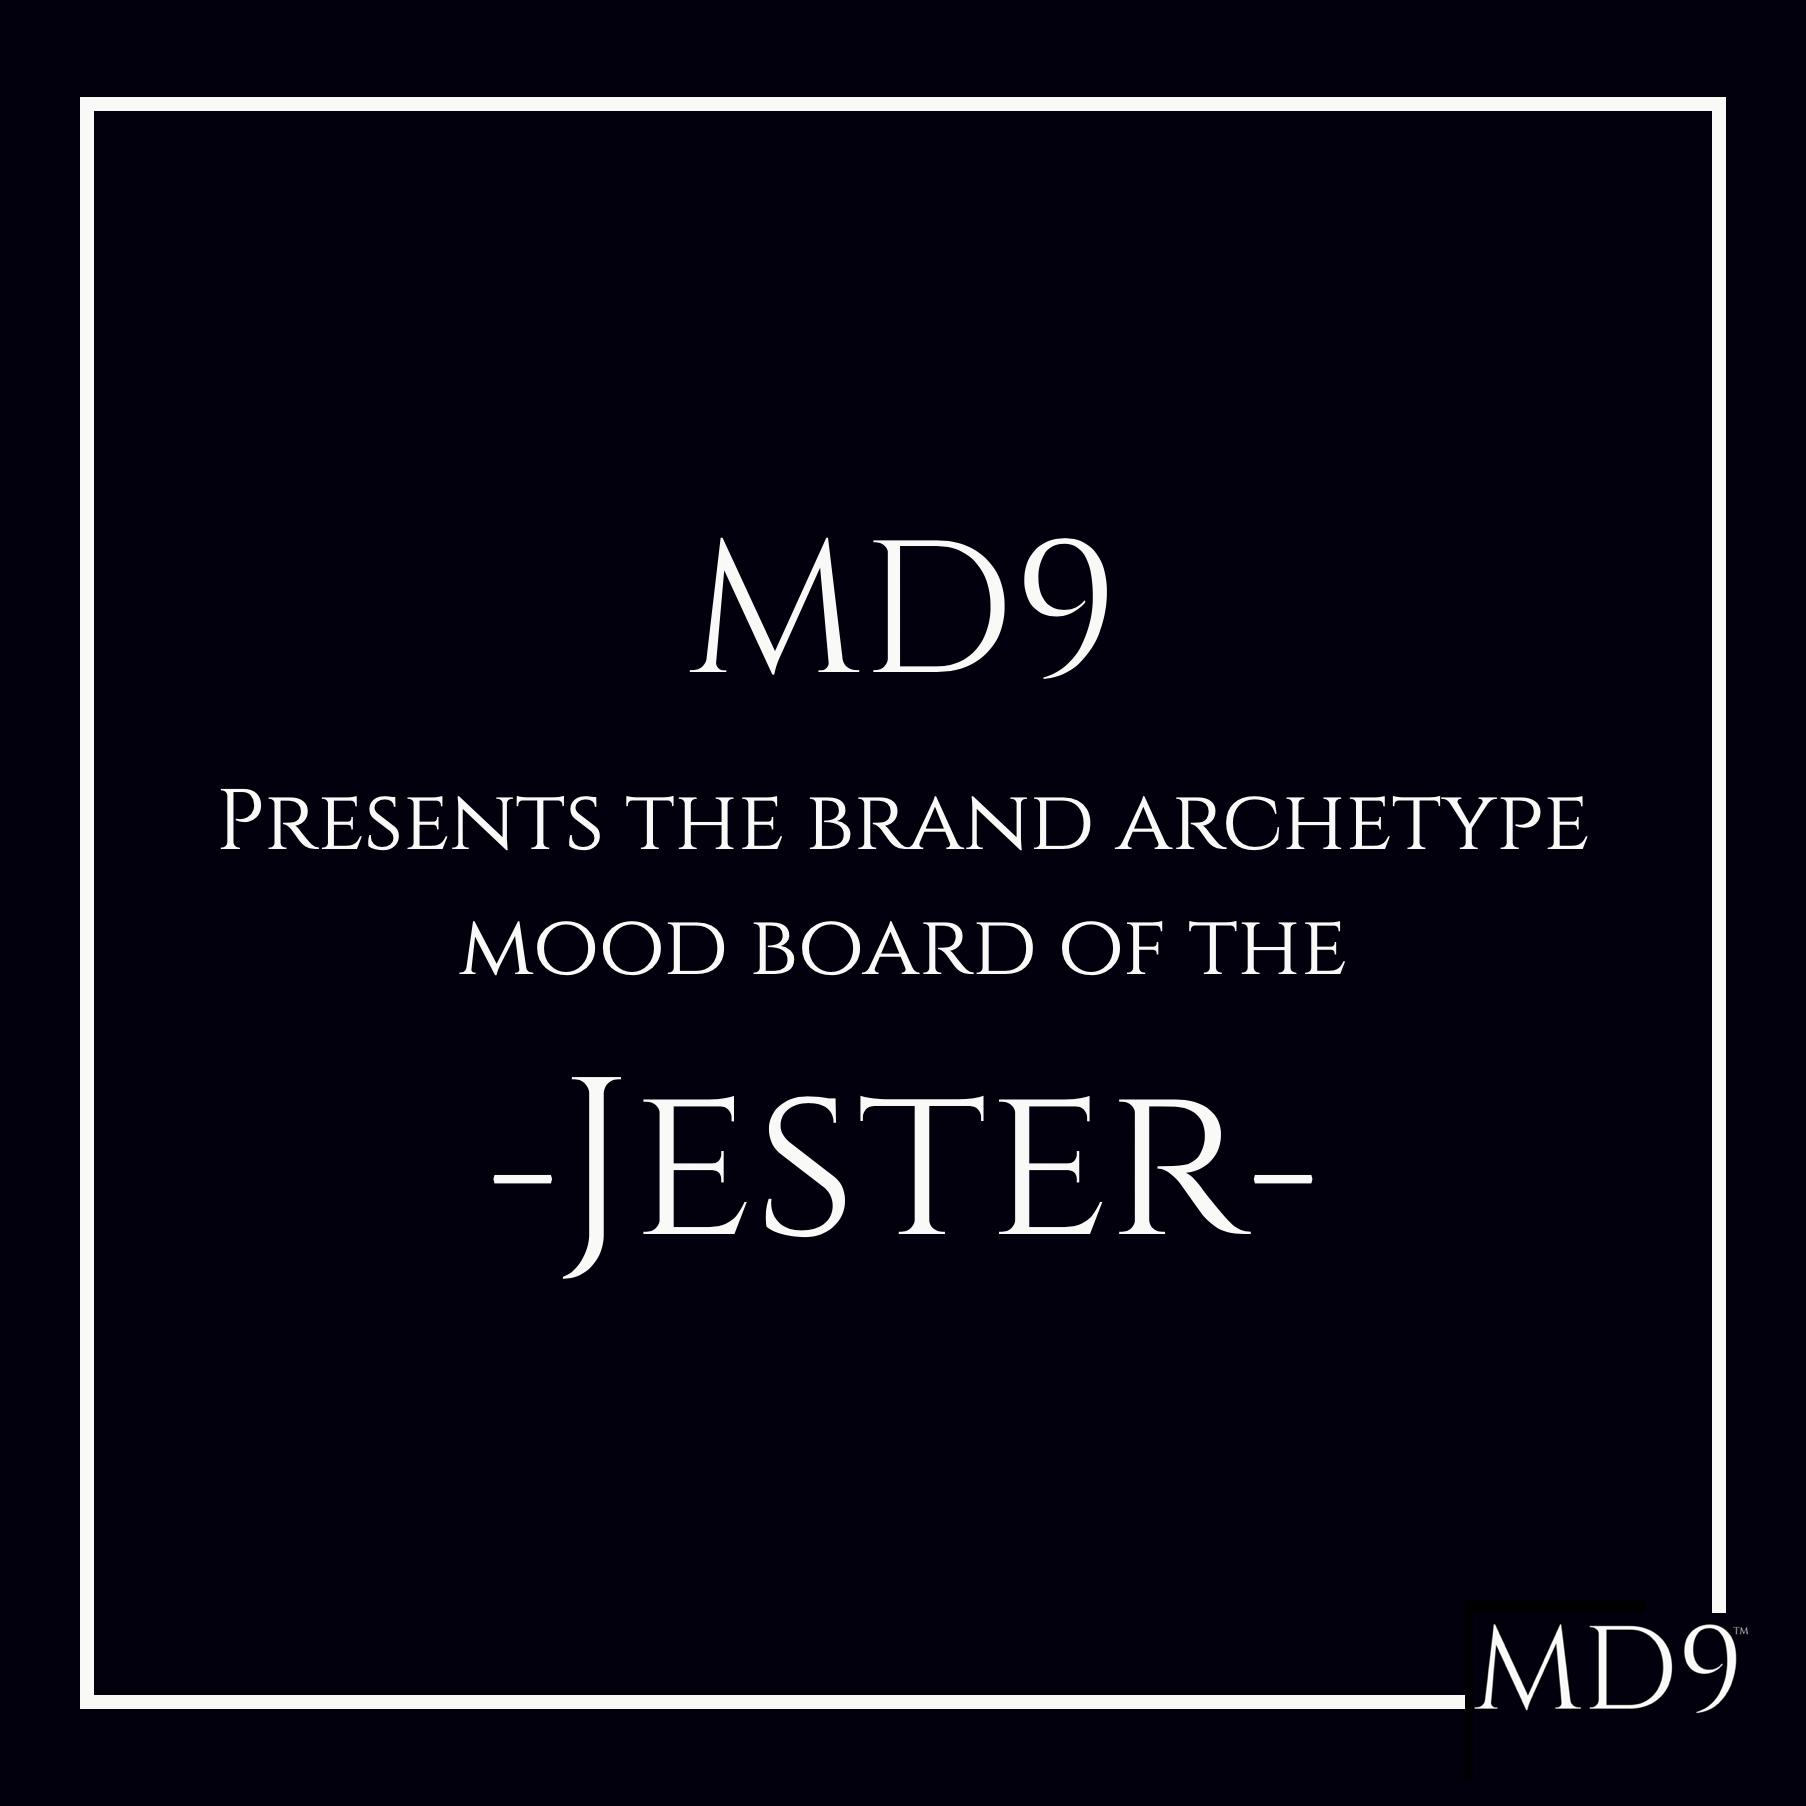 MD9's Brand Archetype Mood Board – Jester